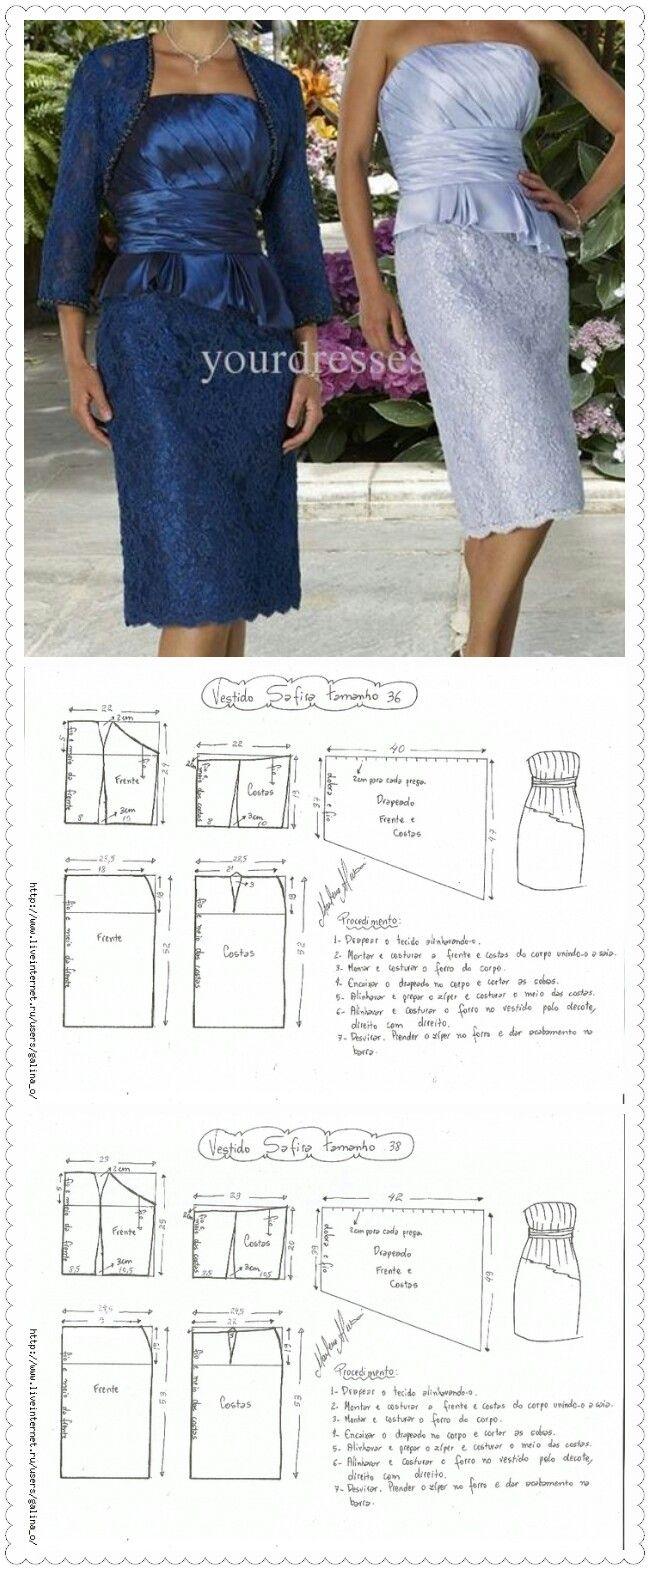 Pin de Anilasofia Gonzalez en costura | Pinterest | Patrones ...